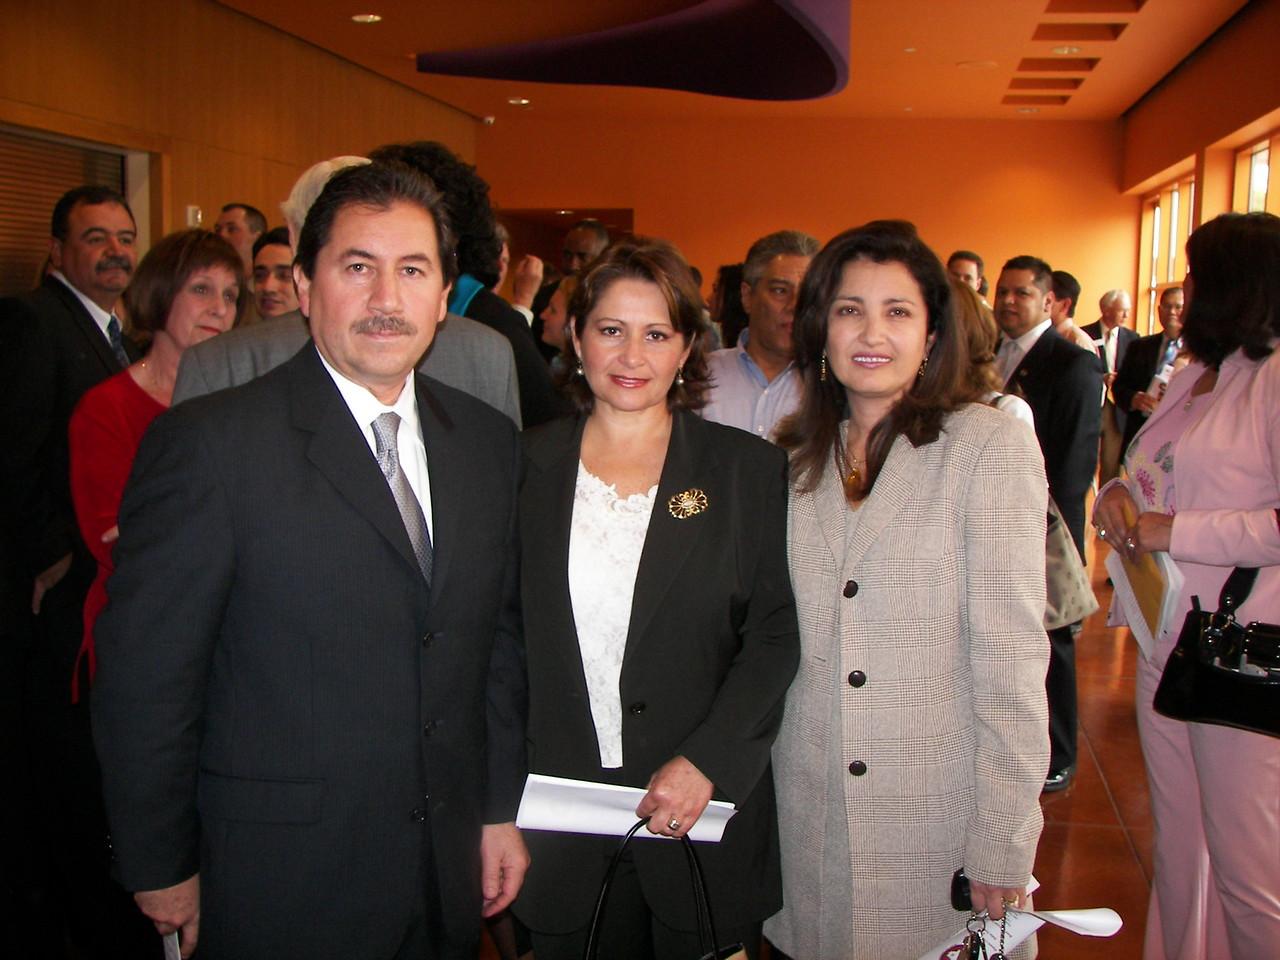 Our Ex-Officio Luis Spinola, Mrs. Spinola and Councilwoman Dr. Elba Garcia